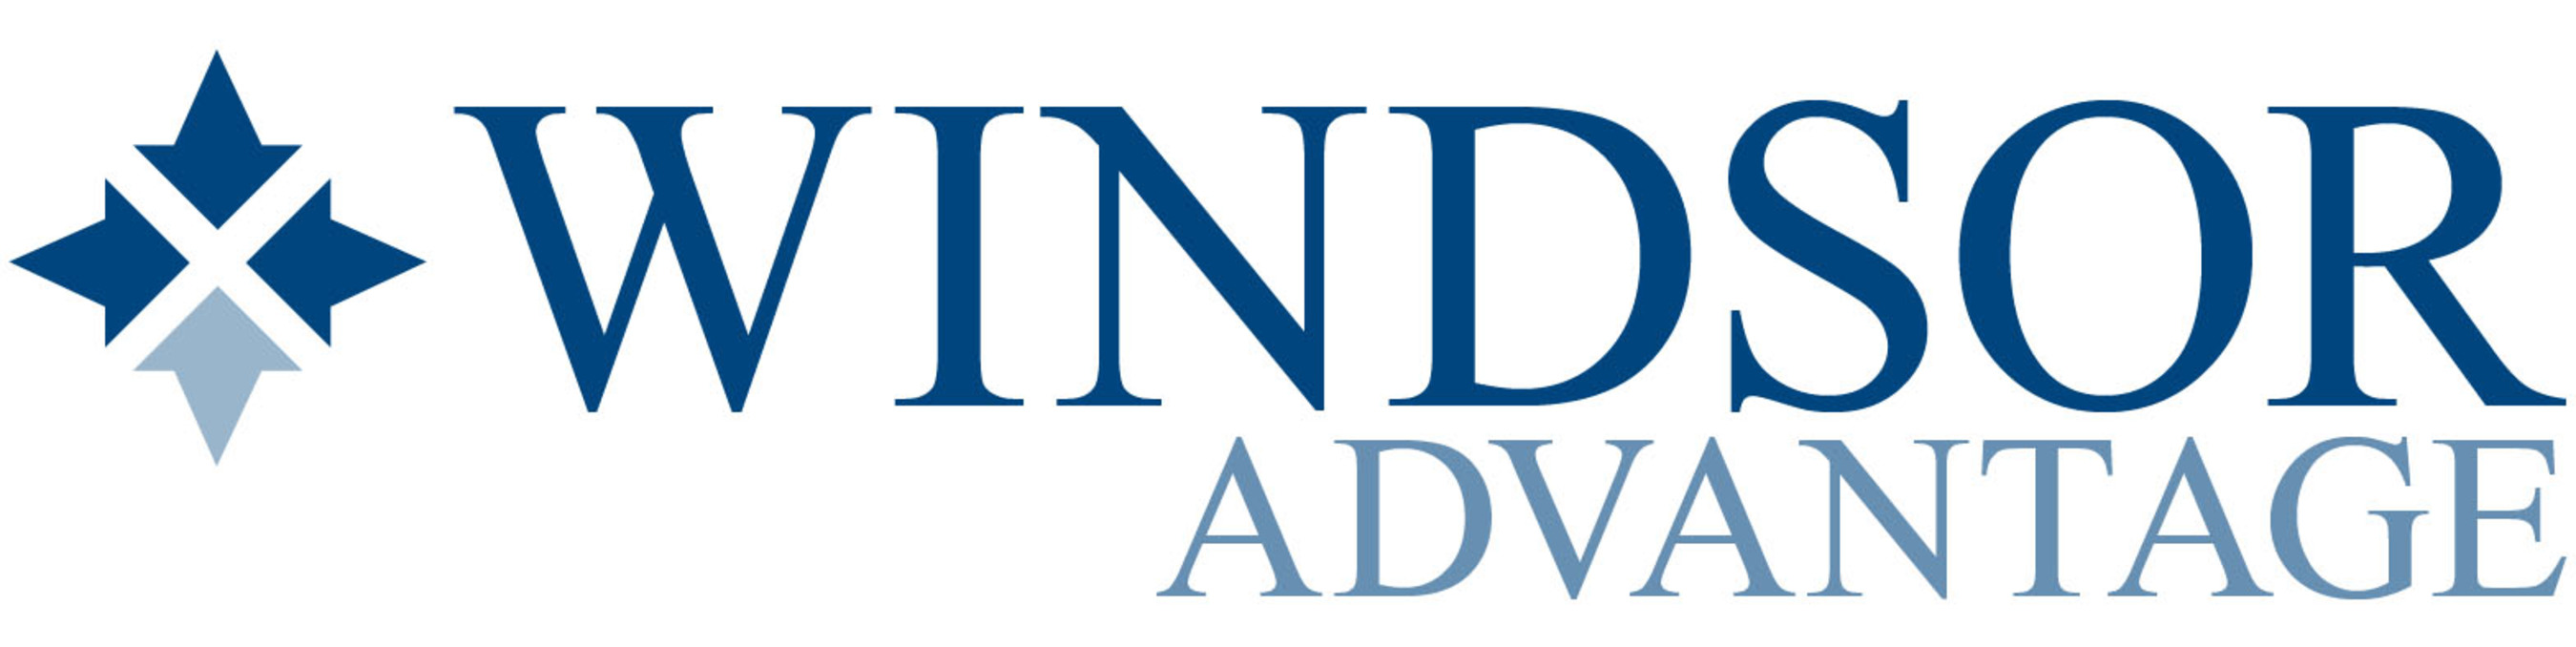 Windsor Advantage logo (PRNewsFoto/Windsor Advantage, LLC)